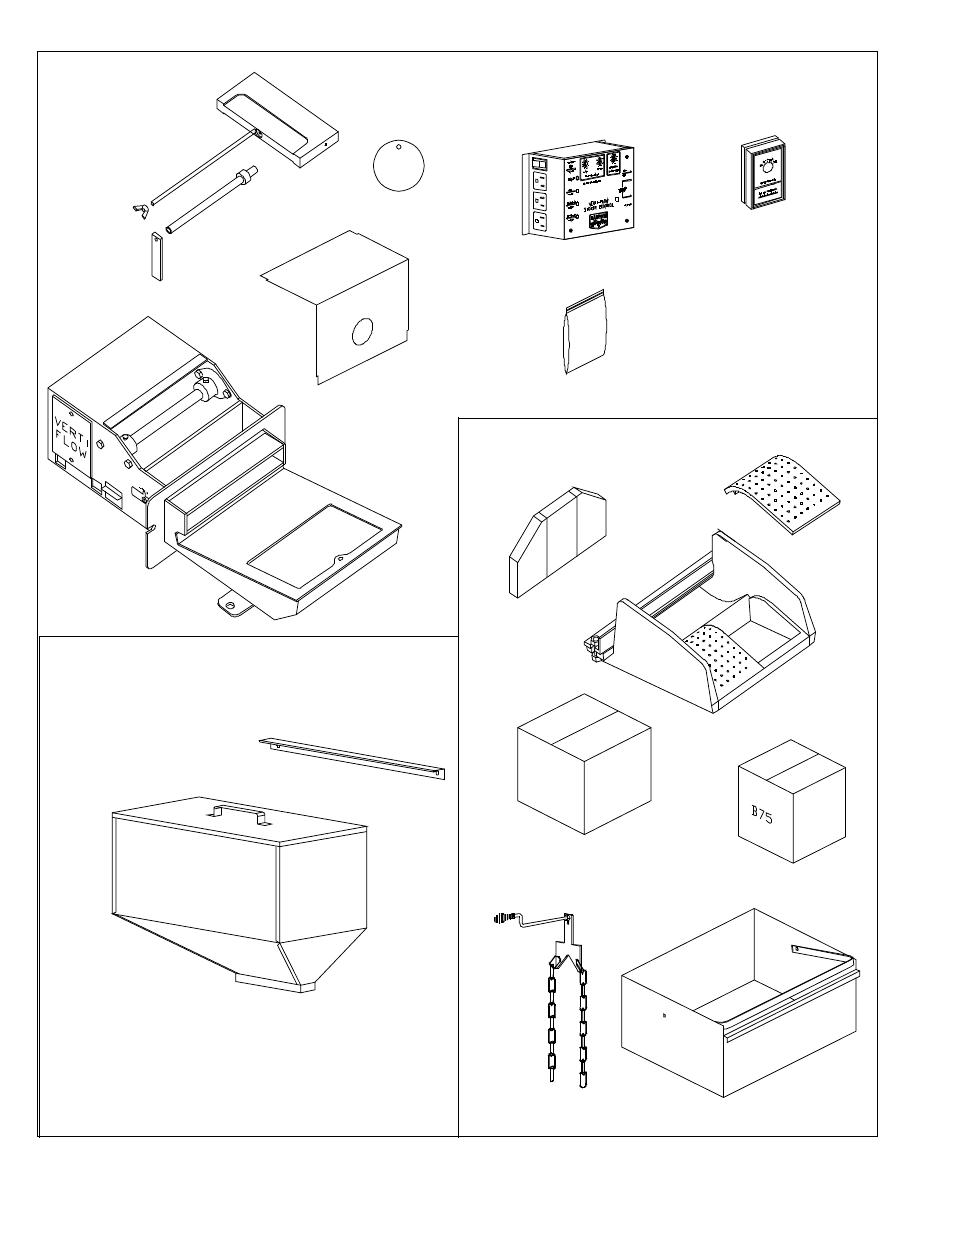 Packing list, Parts inside stove parts inside hopper box